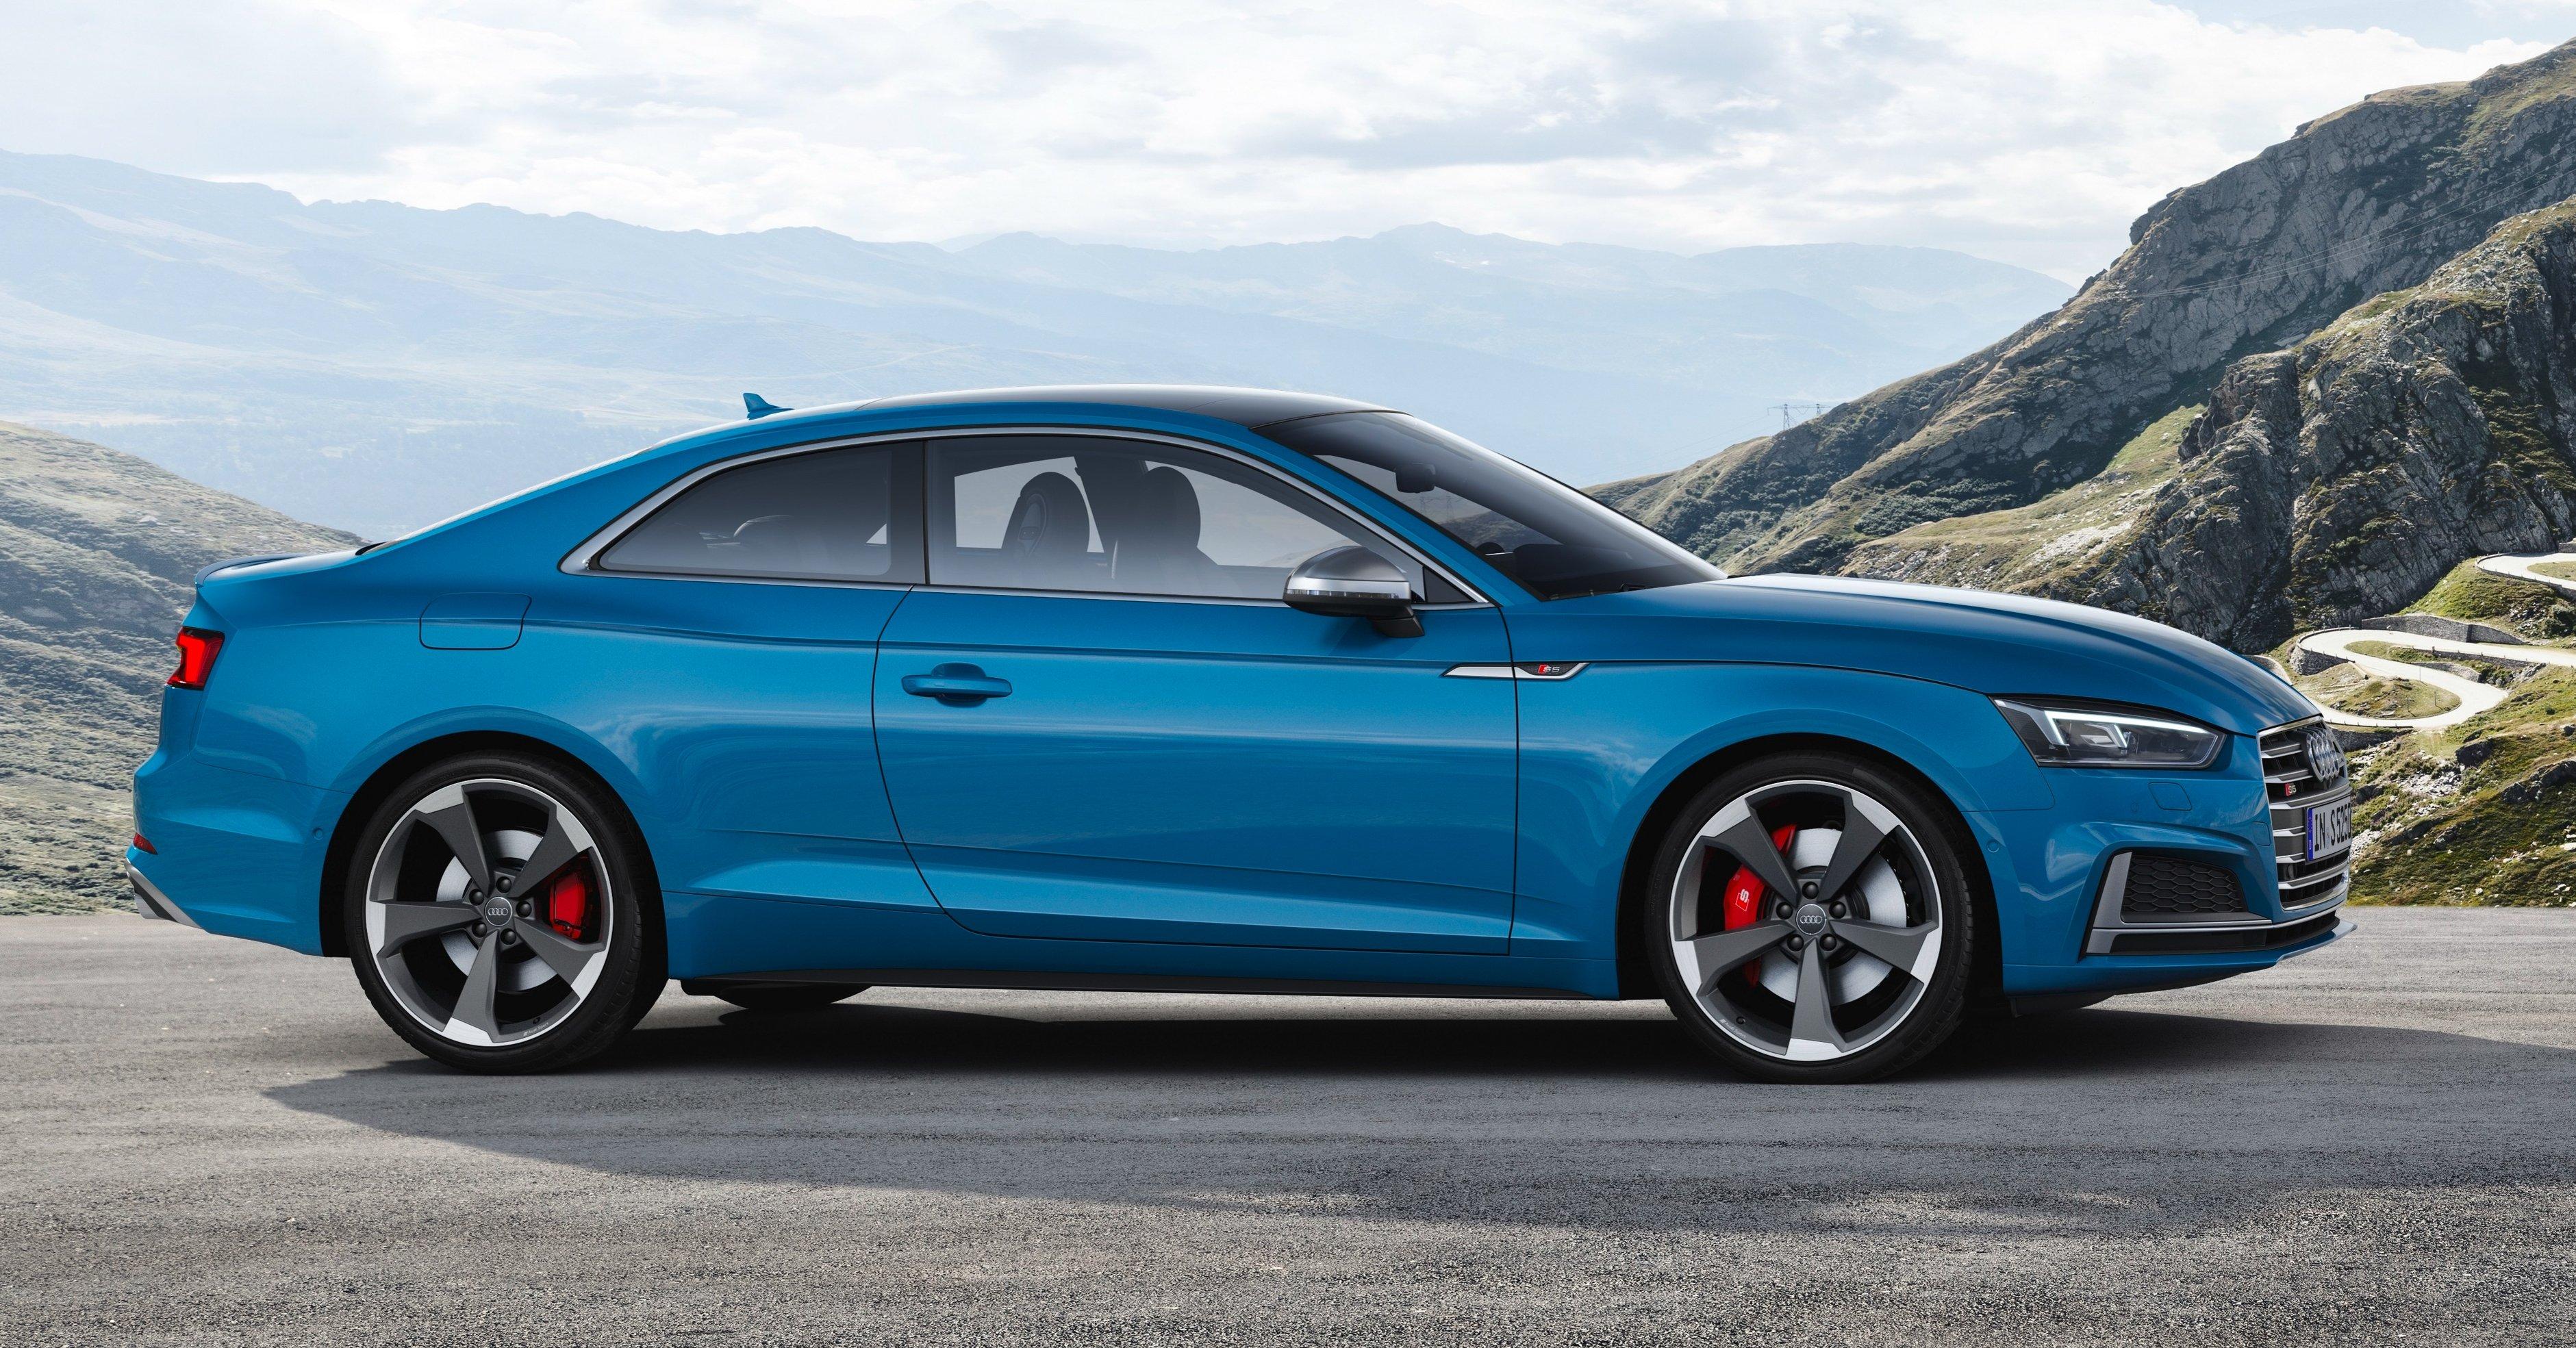 2020 Audi S5 - 3.0 TDI mild hybrid, 347 PS & 700 Nm! Paul ...